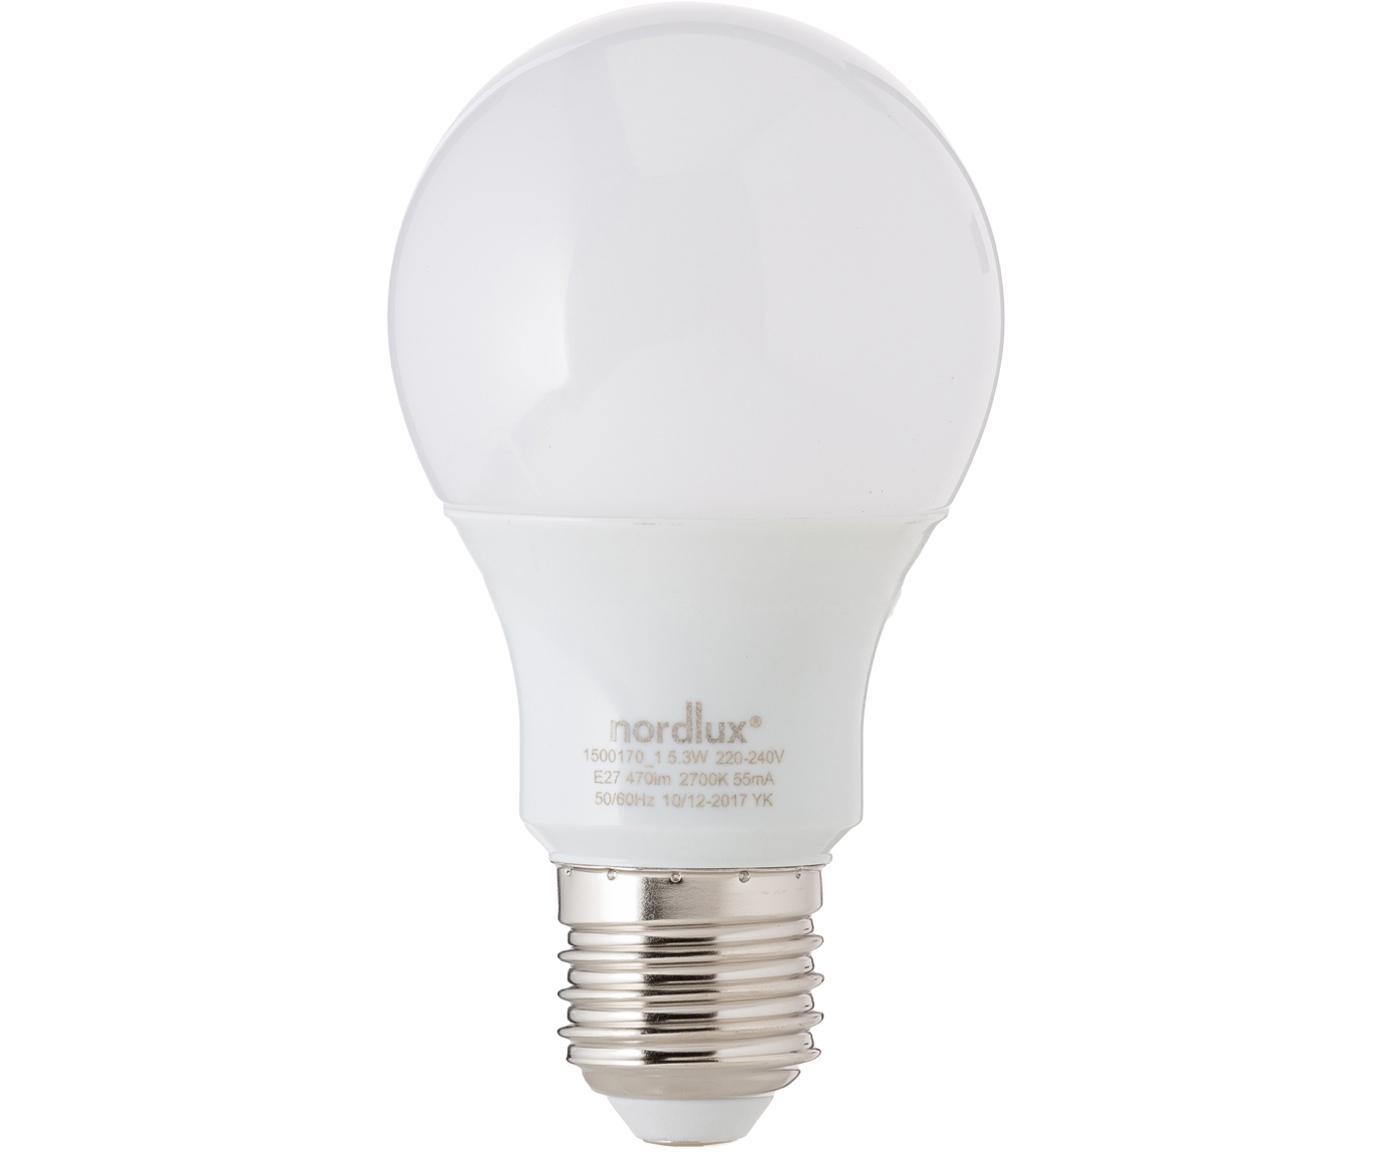 Lampadina LED Morning (E27 / 5Watt) 5 pz., Paralume: vetro opale, Base lampadina: alluminio, Bianco, Ø 7 x A 11 cm